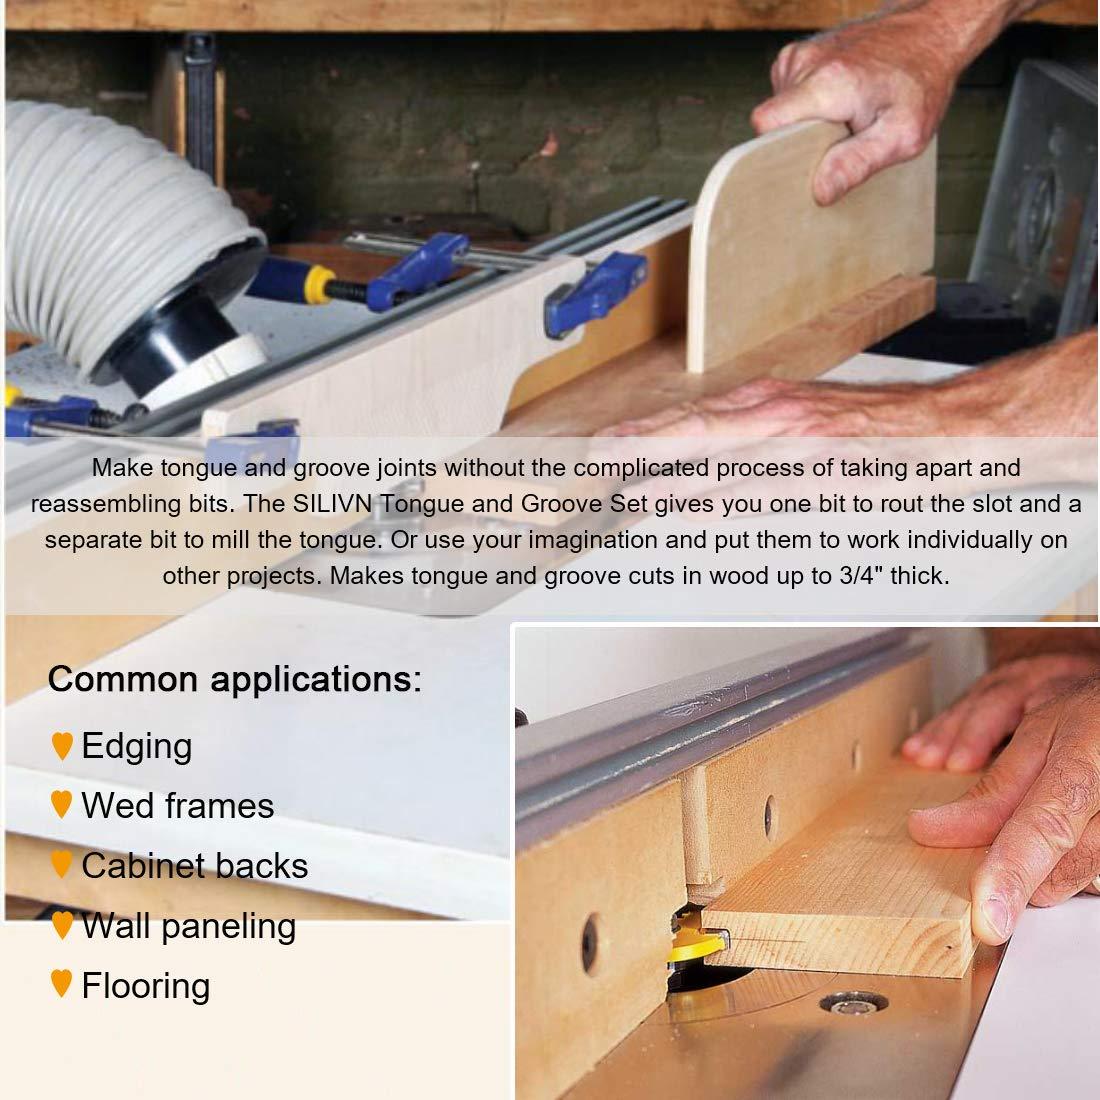 Silivn Tongue And Groove Set Router Bit Set Wood Door Flooring 3